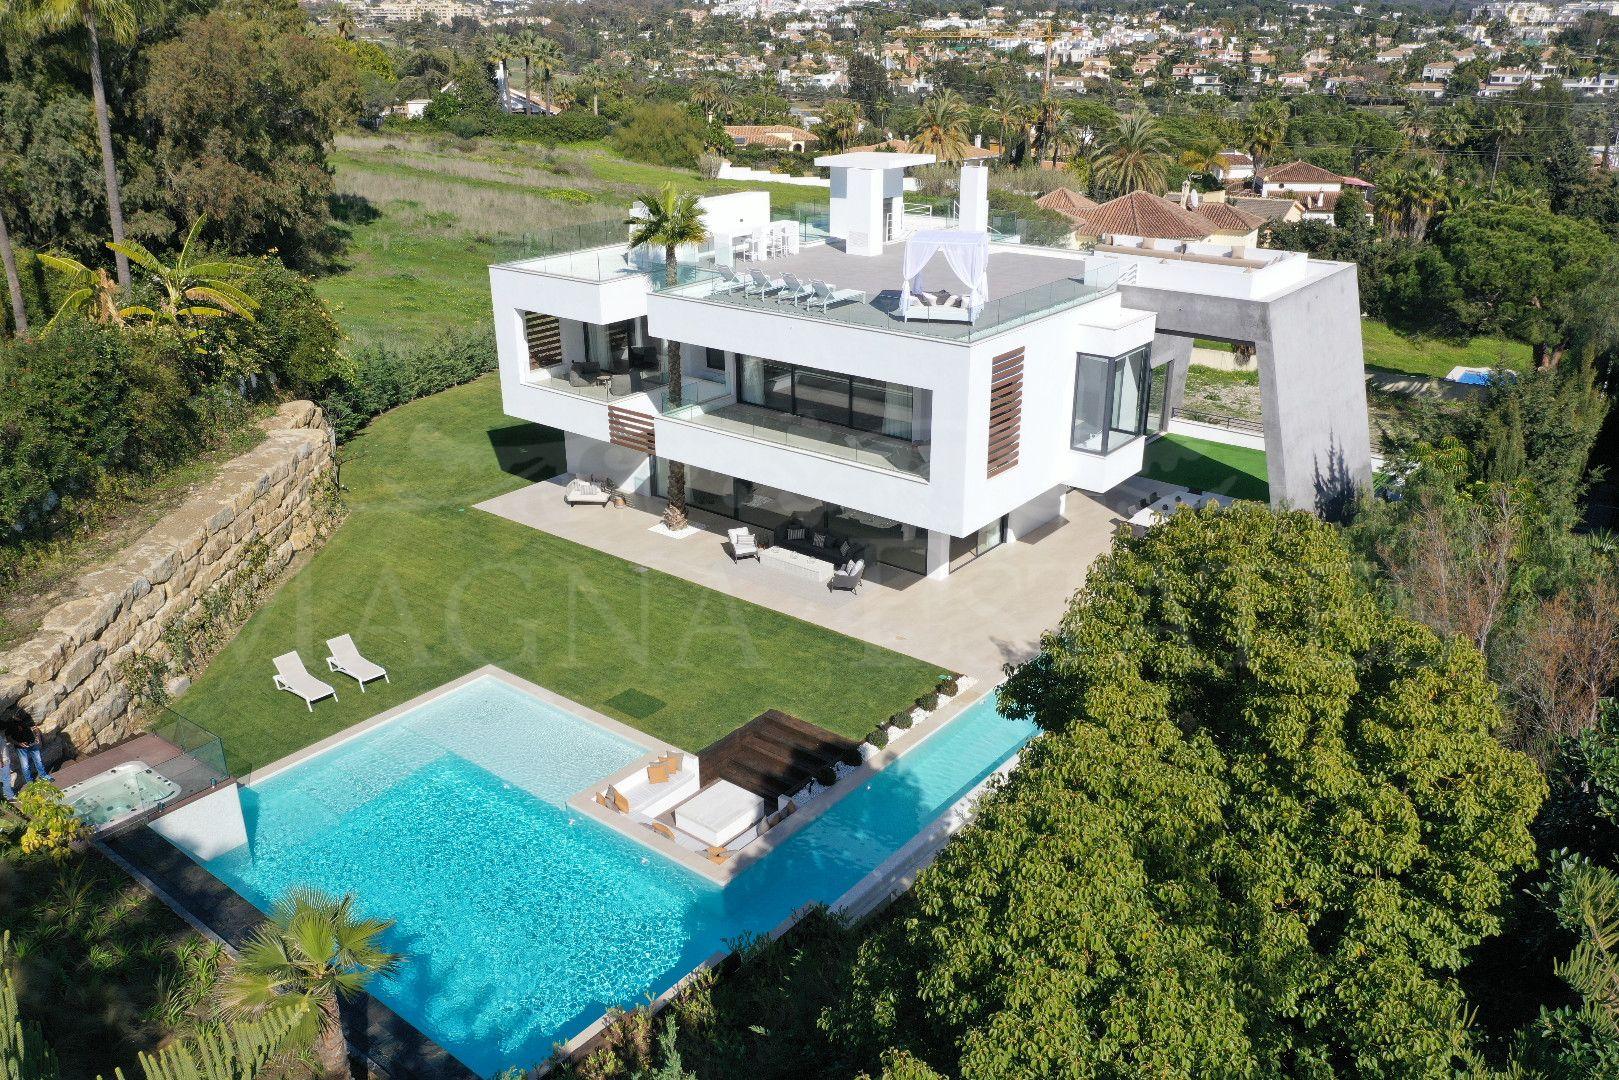 Newly built villa in the heart of Nueva Andalucía, Marbella